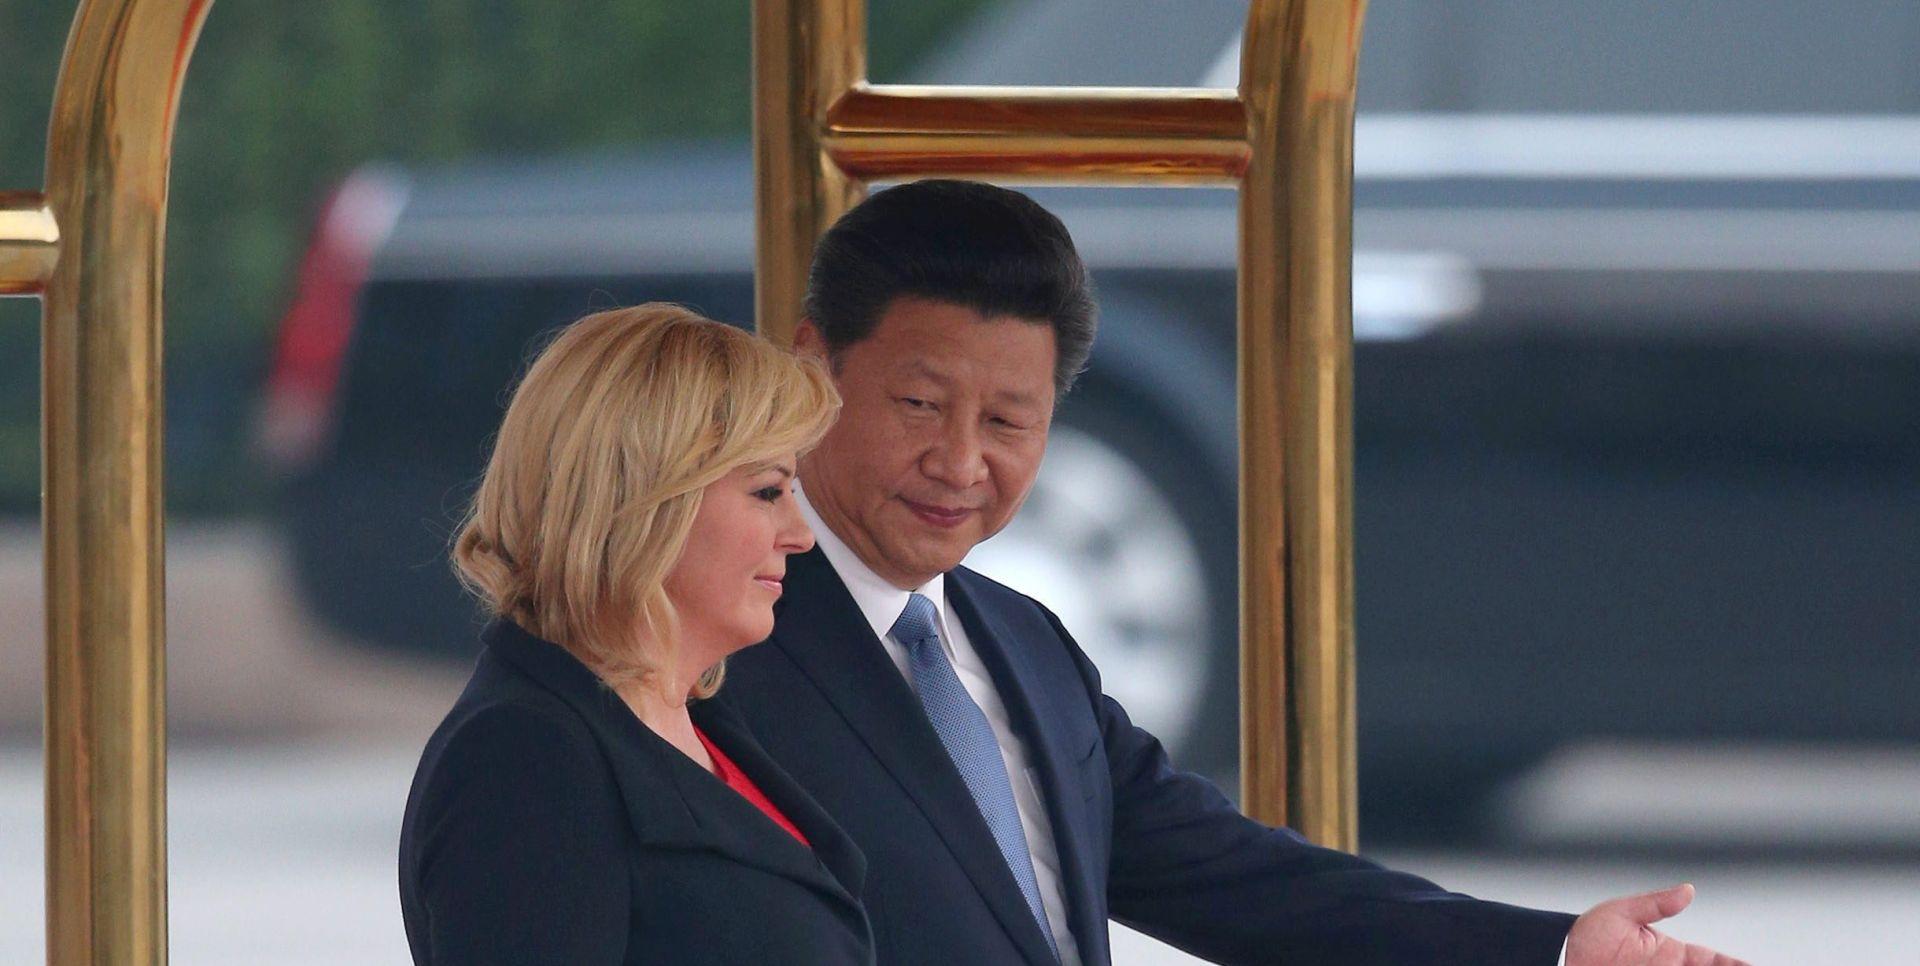 XI JINPING GOŠĆI IZ ZAGREBA: 'Kineski san' kao 'Za bolju Hrvatsku'